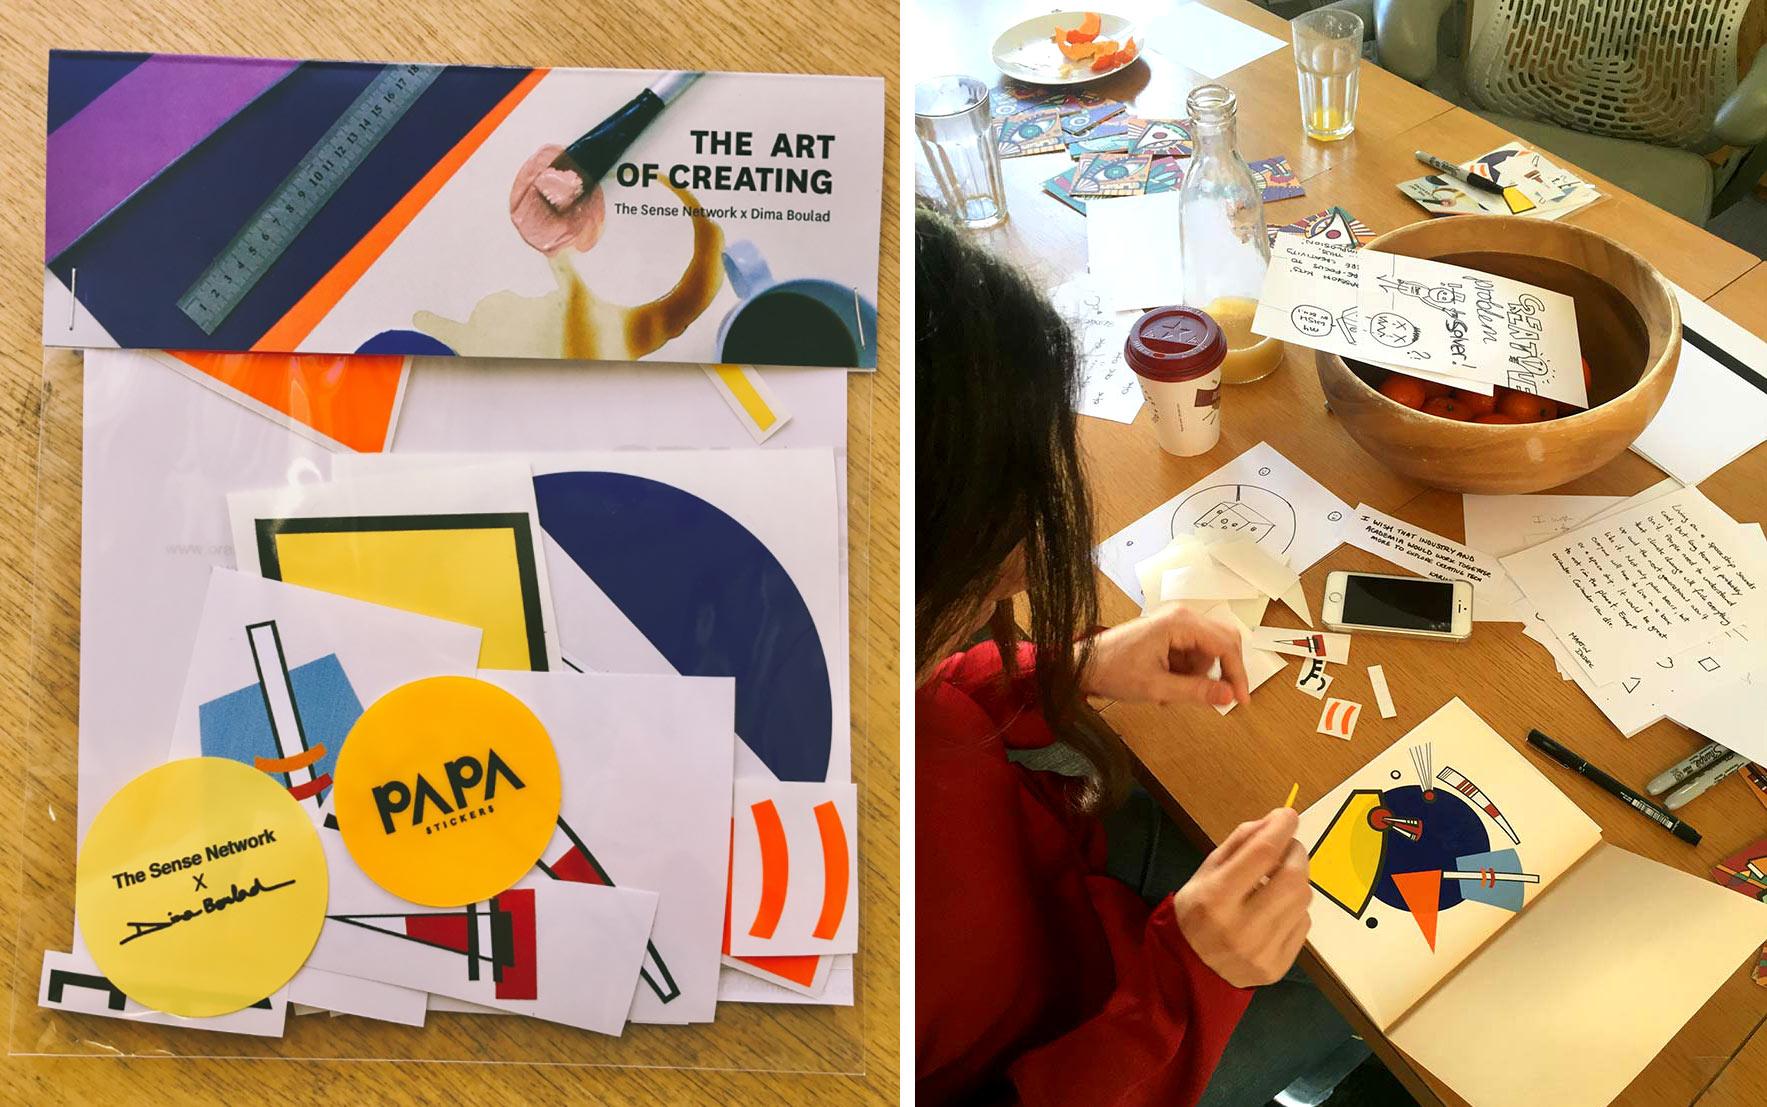 Talia assembling her sticker.